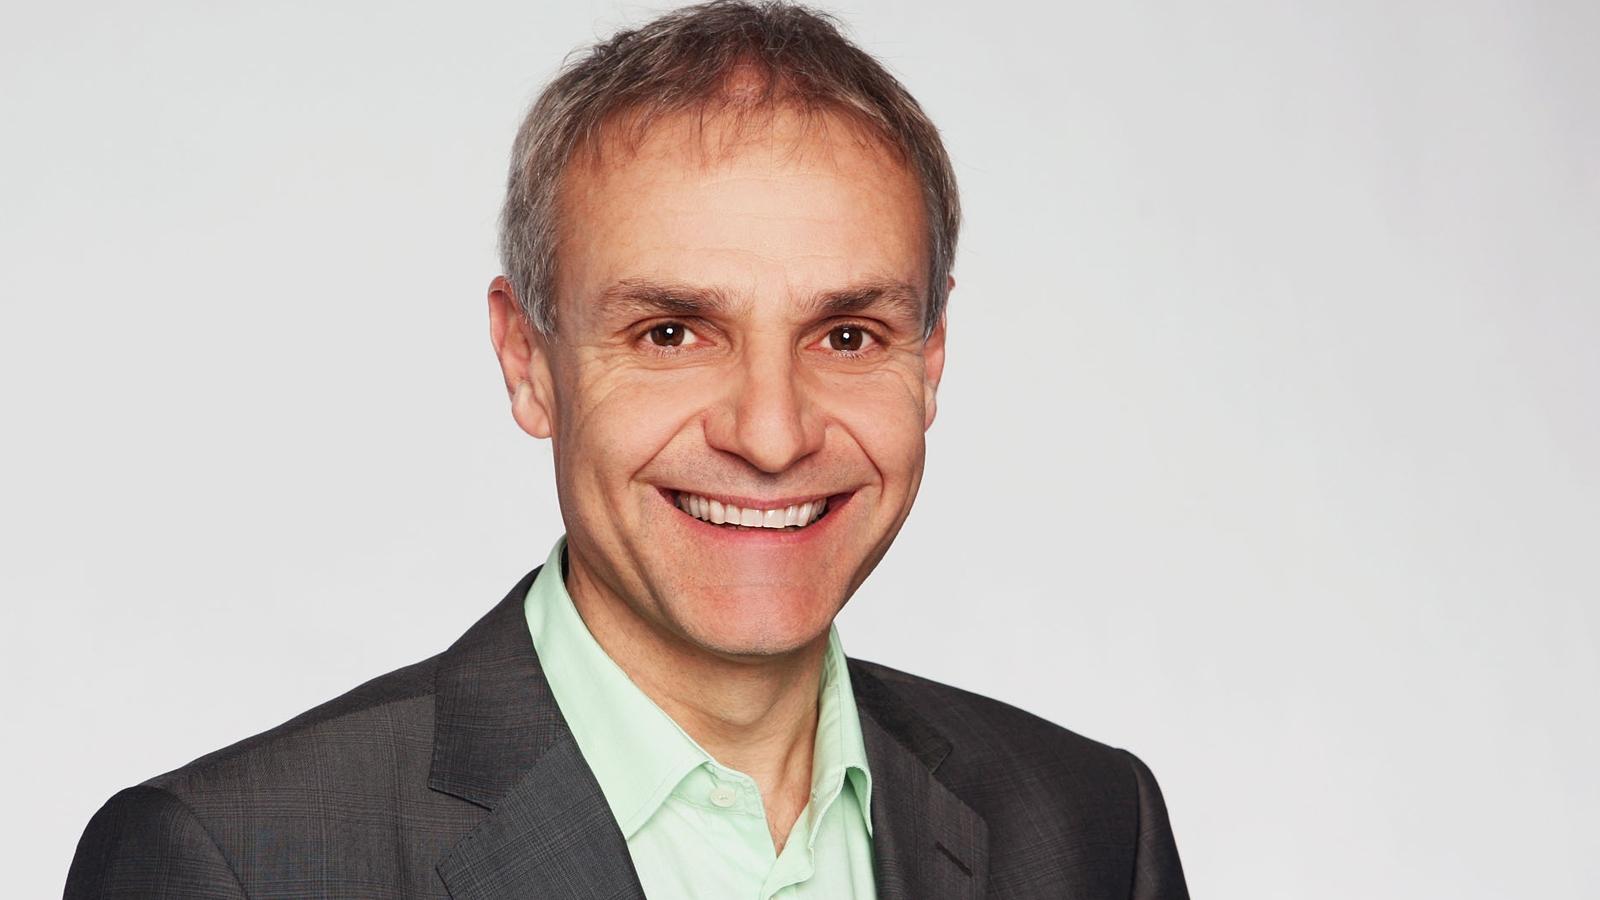 SRF-Kommentator Michael Stäuble zum GP Australien (Radio SRF 1)